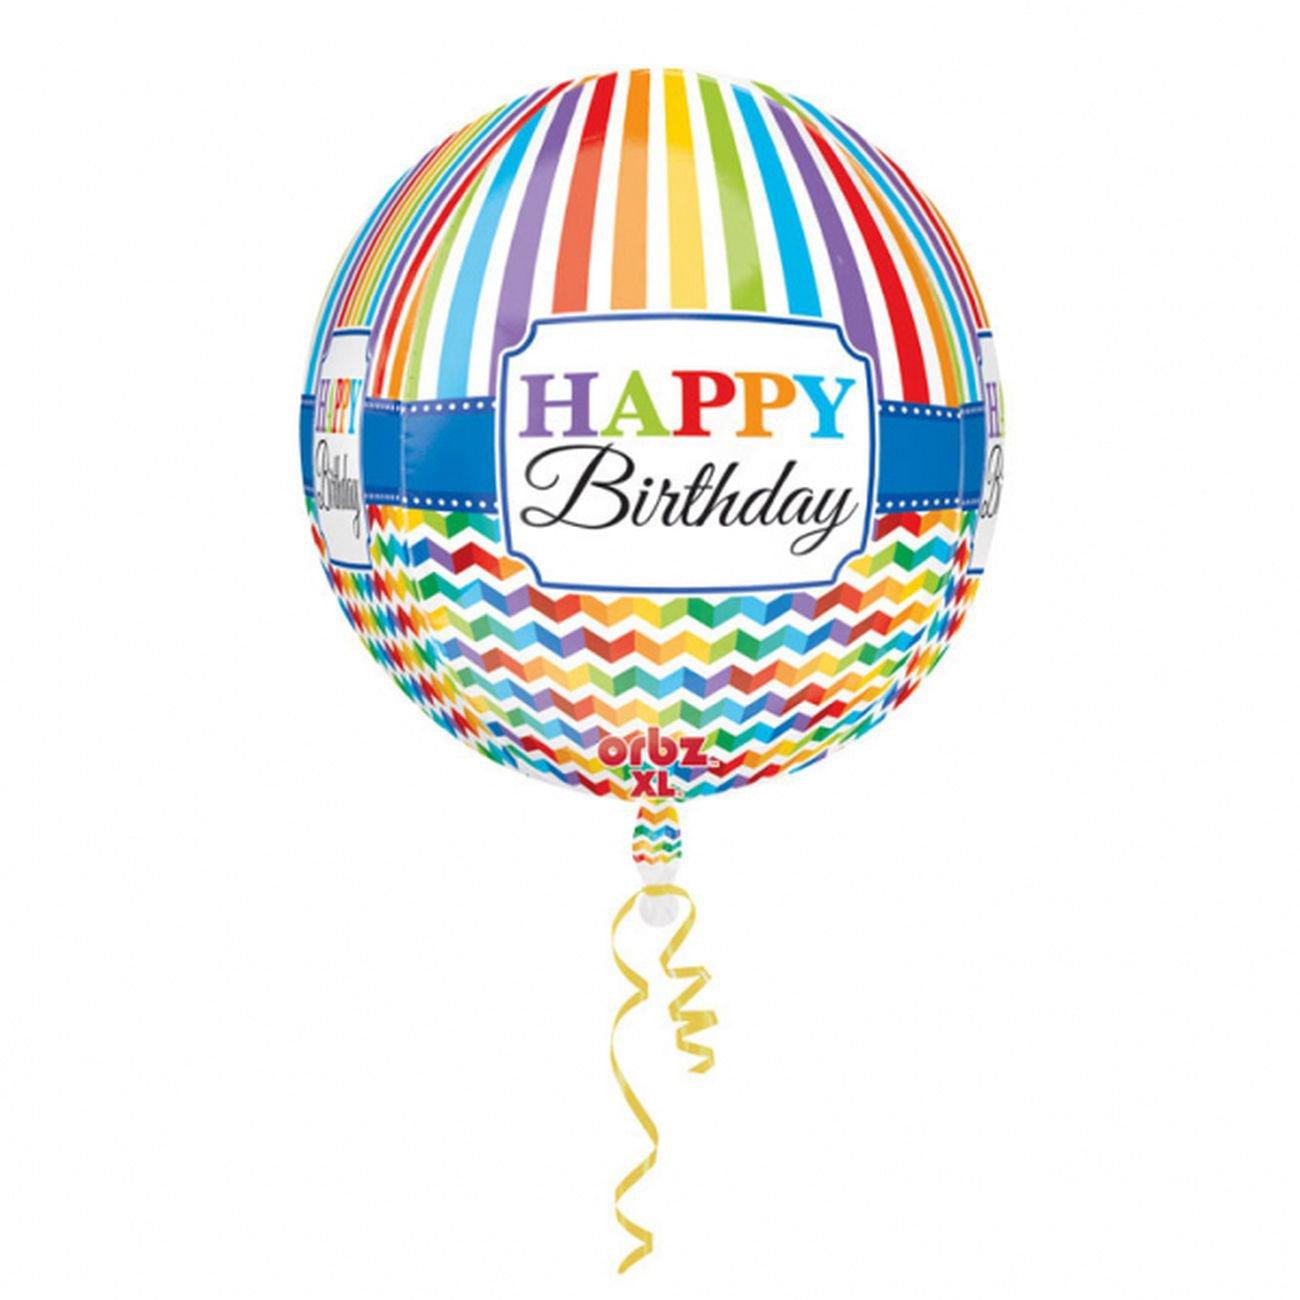 Multicolor 16 Anagram International Happy Birthday Bright Stripe Chevron Orbz Balloon